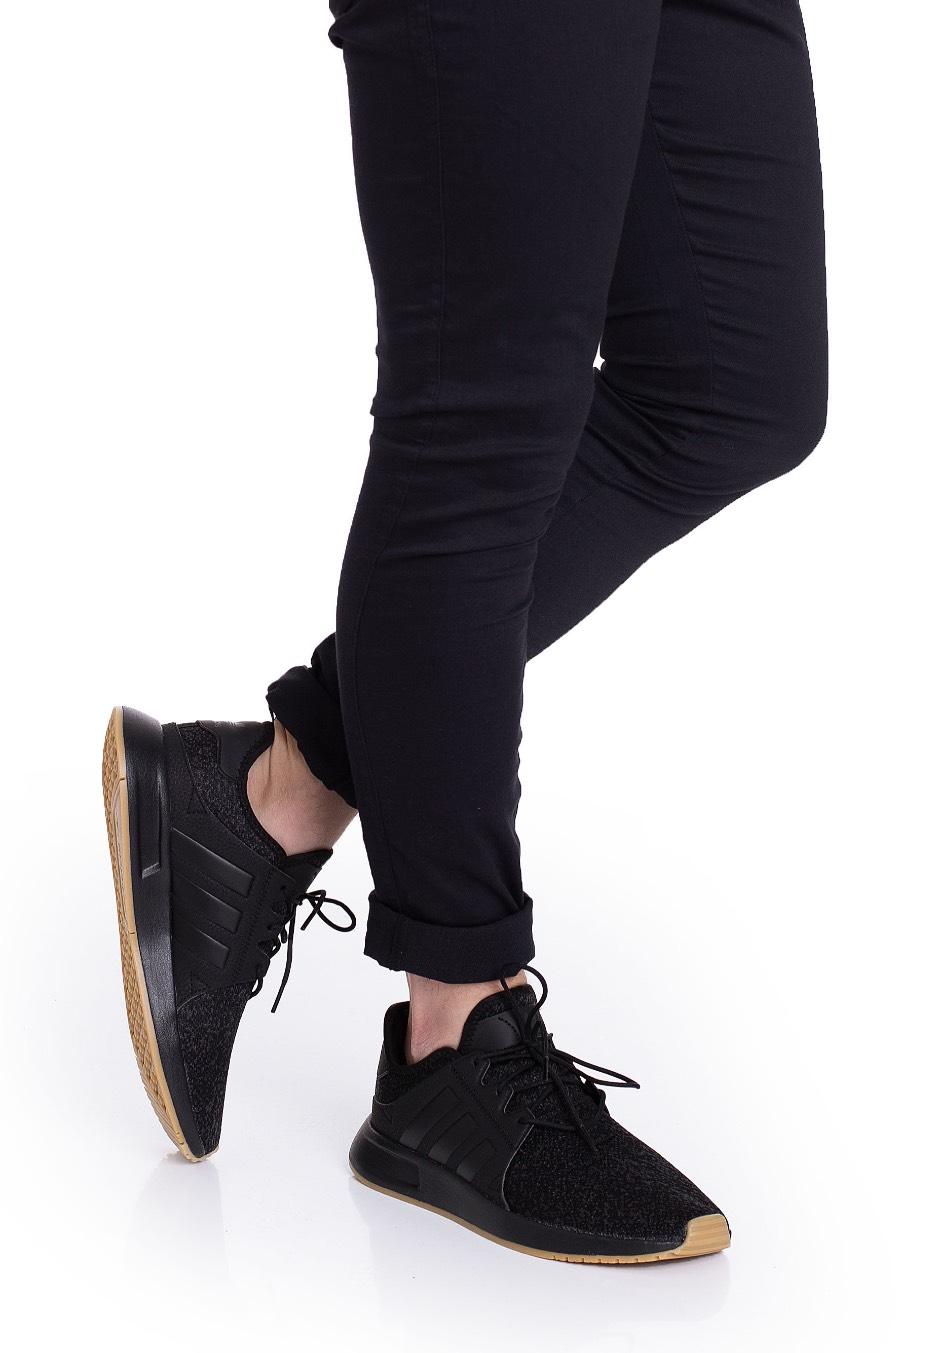 Adidas - X_PLR Core Black/Core Black